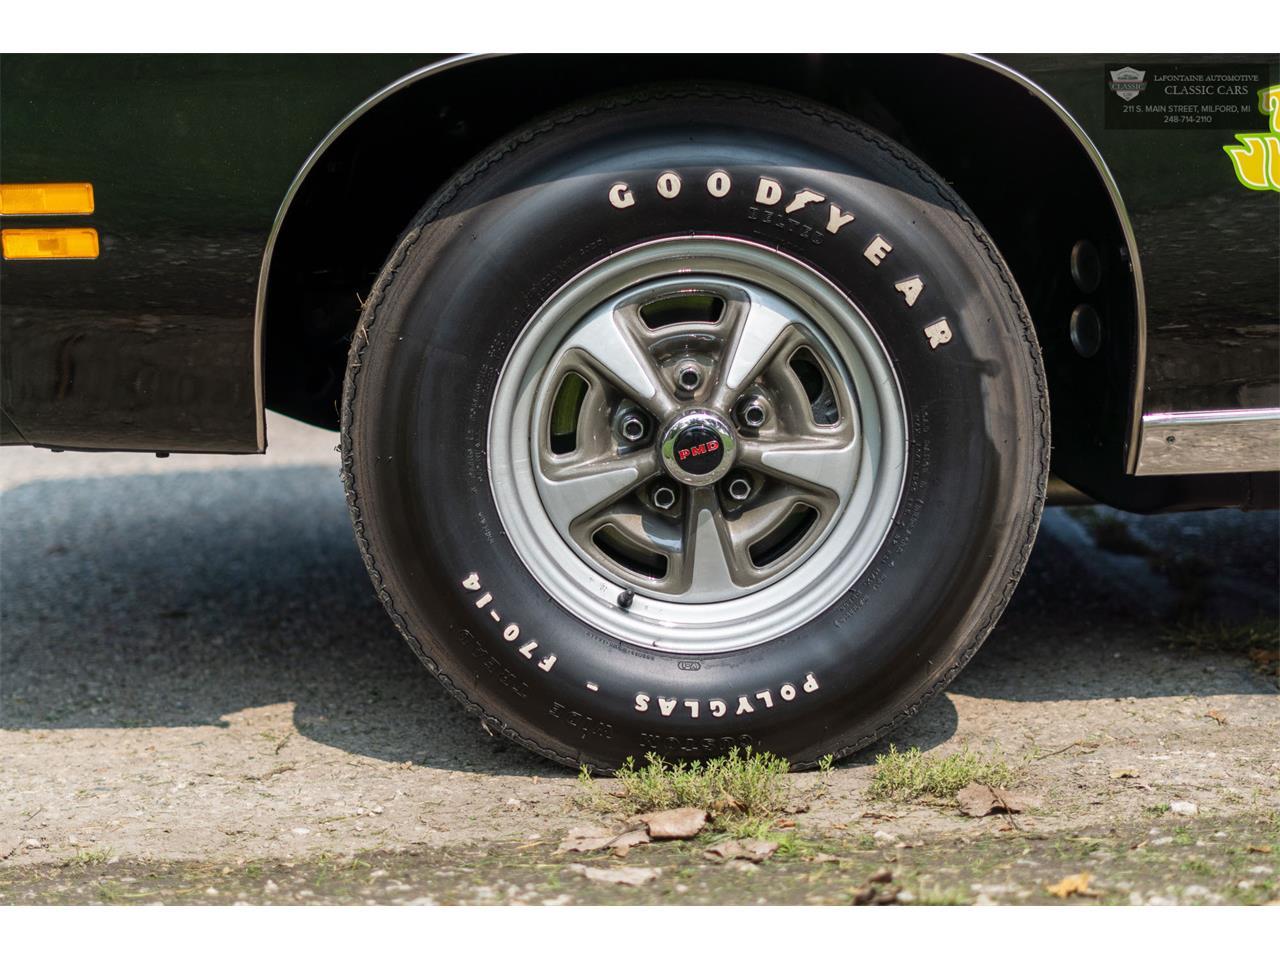 1971 Pontiac GTO (The Judge) (CC-1392956) for sale in Milford, Michigan